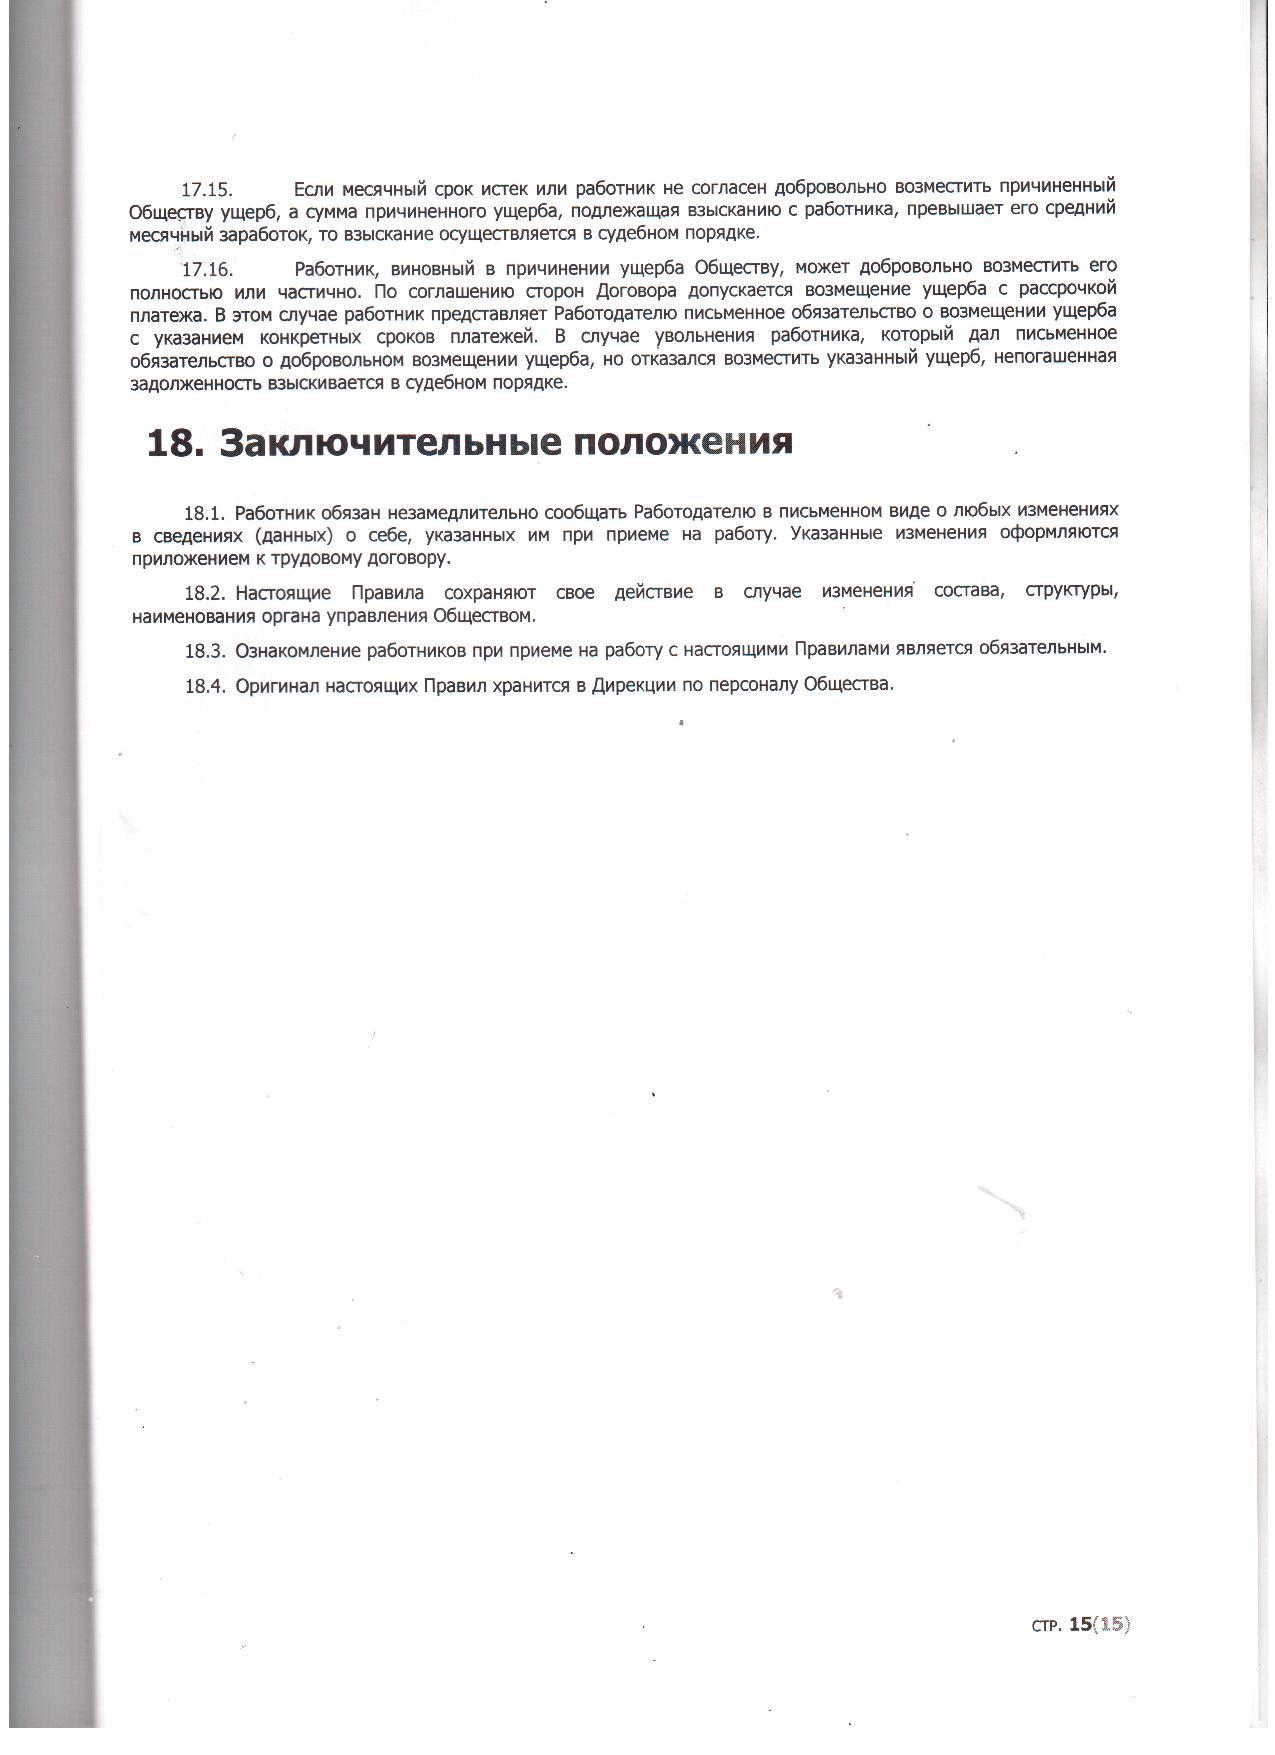 Правила внутреннего трудоговоро распорядка 15